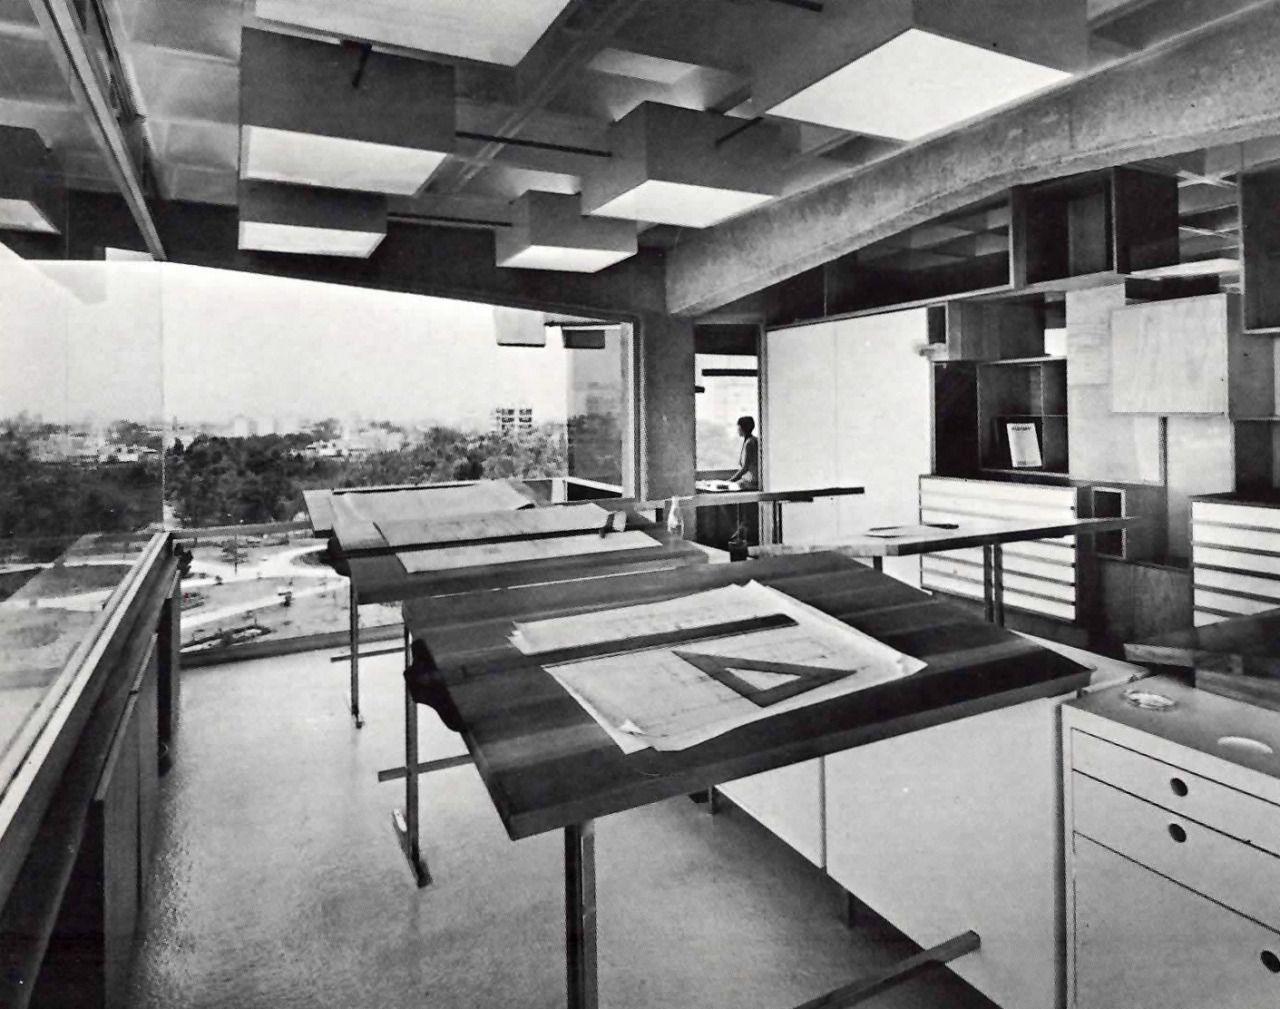 Arqs. Carlos E. Alvarado y Germán Herrasti  Drafting studio on the 6th floor, av. Porfirio Diaz 100, Extremadura Insurgentes, Mexico City 1967